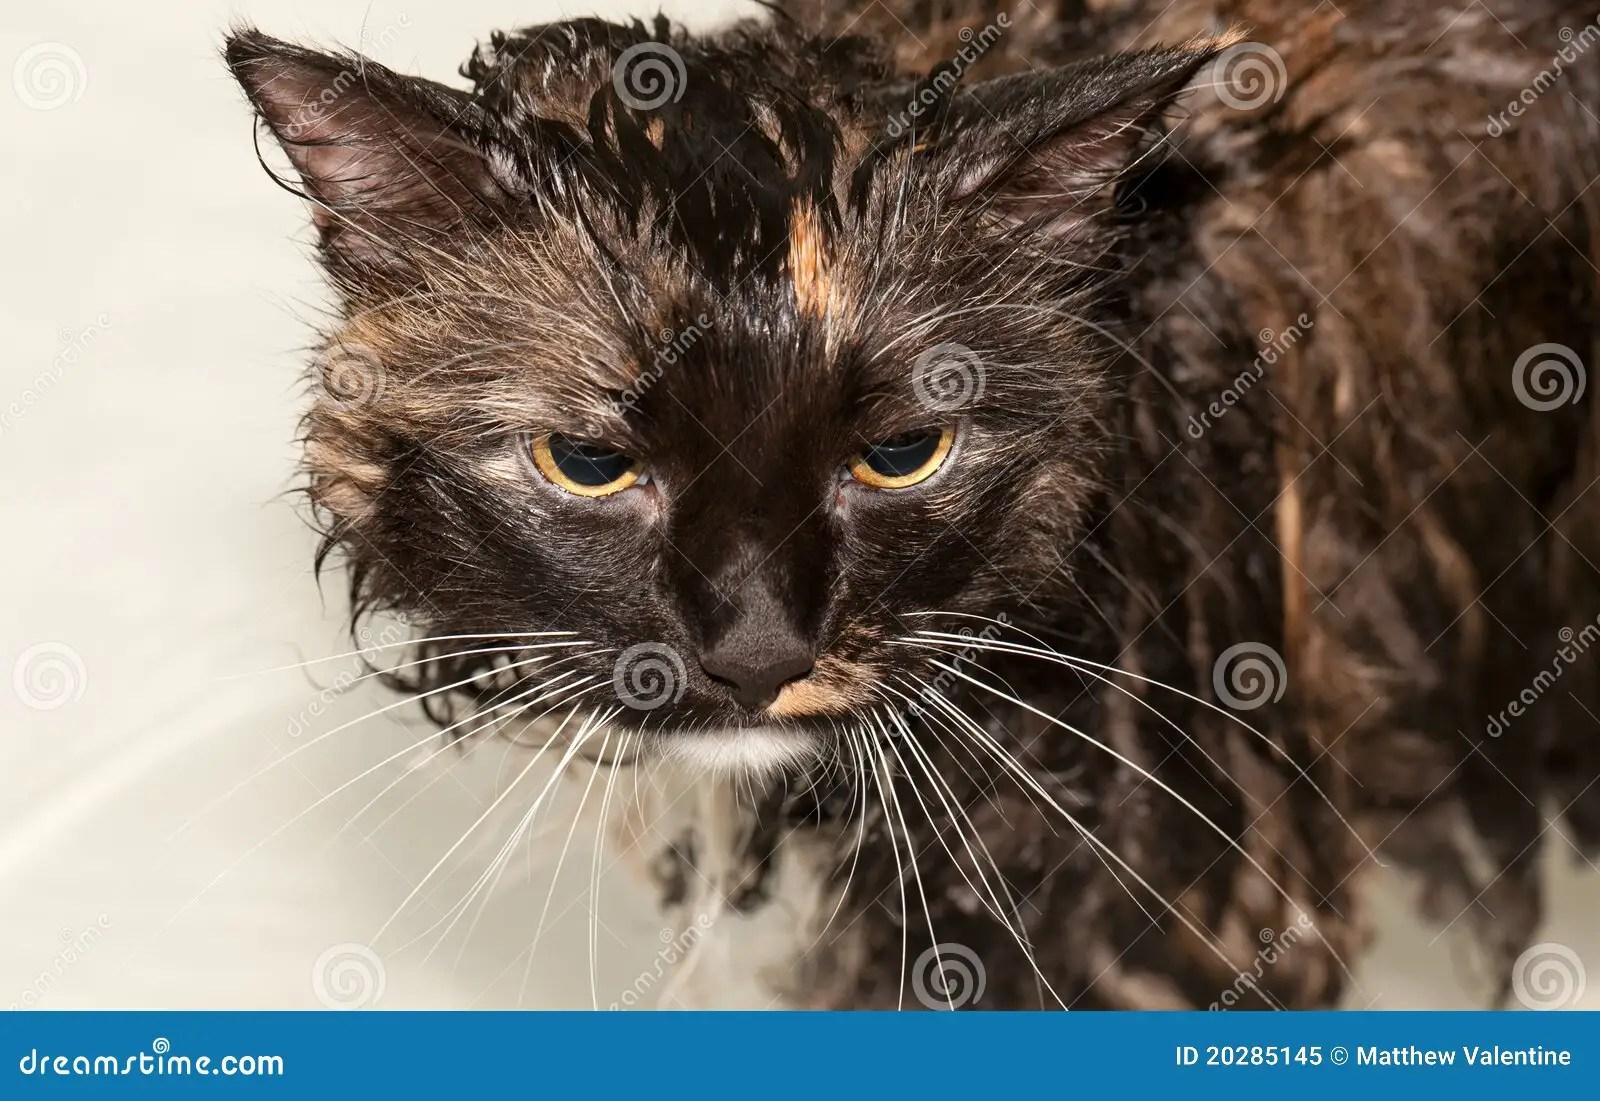 Wet Cat In Bathtub Royalty Free Stock Photo Image 20285145